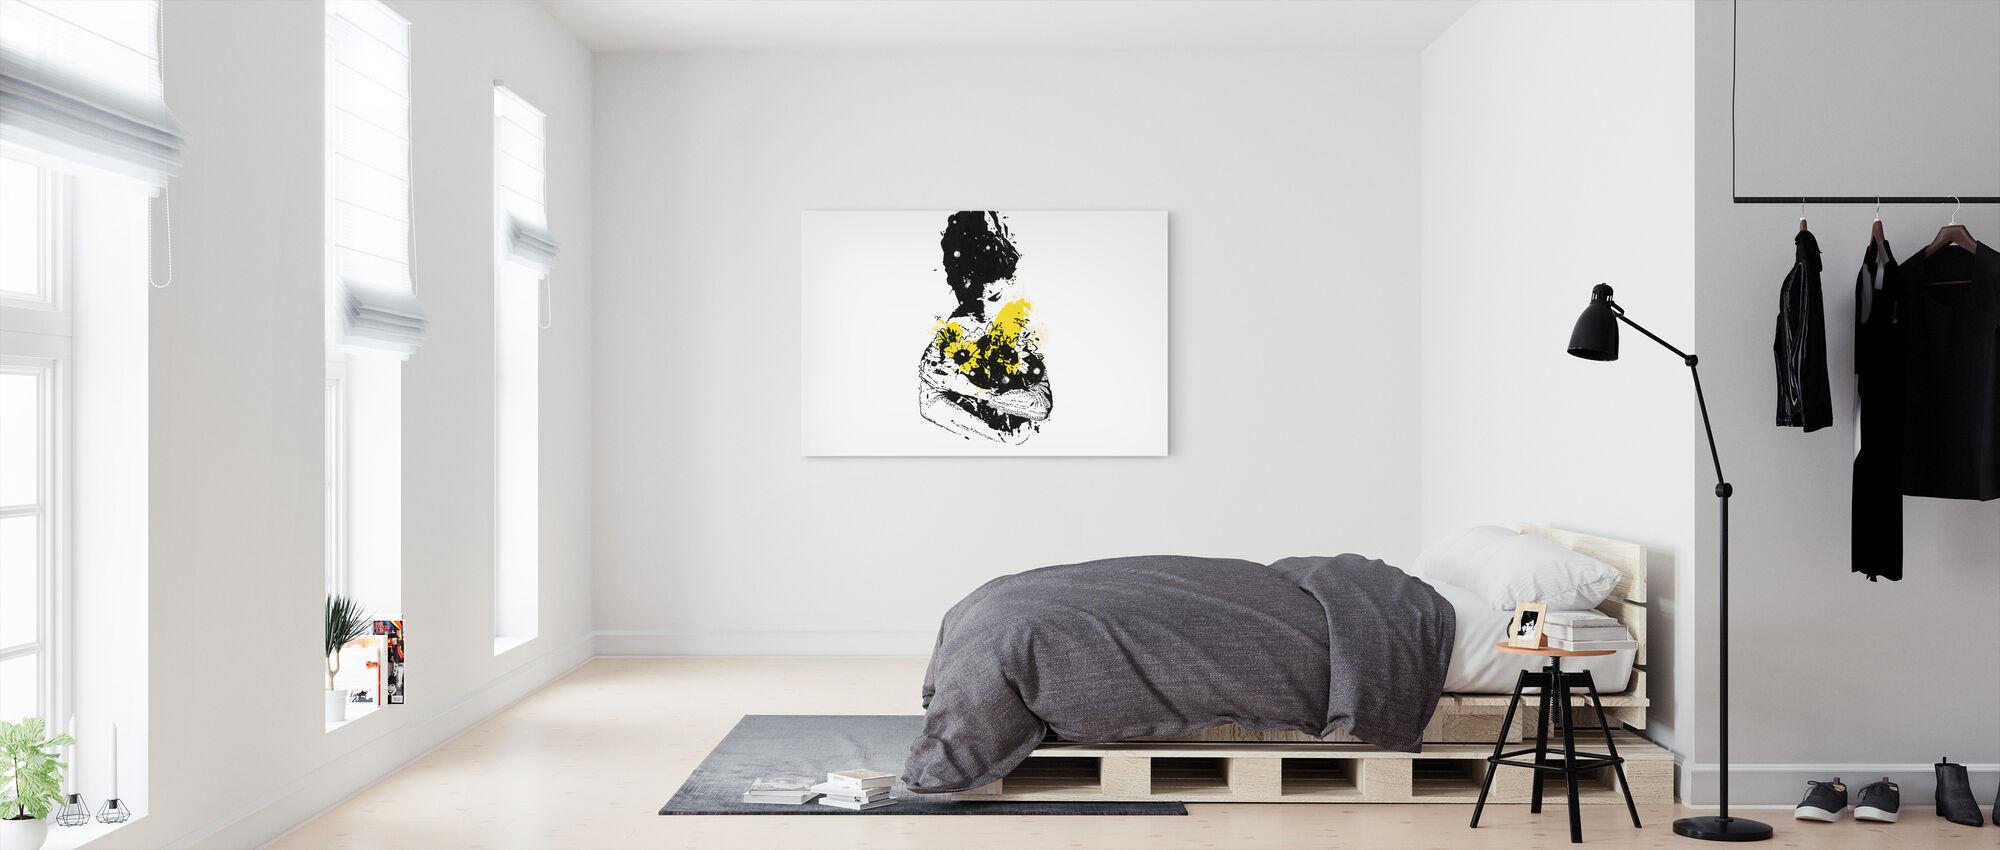 Rioter - Canvas print - Bedroom